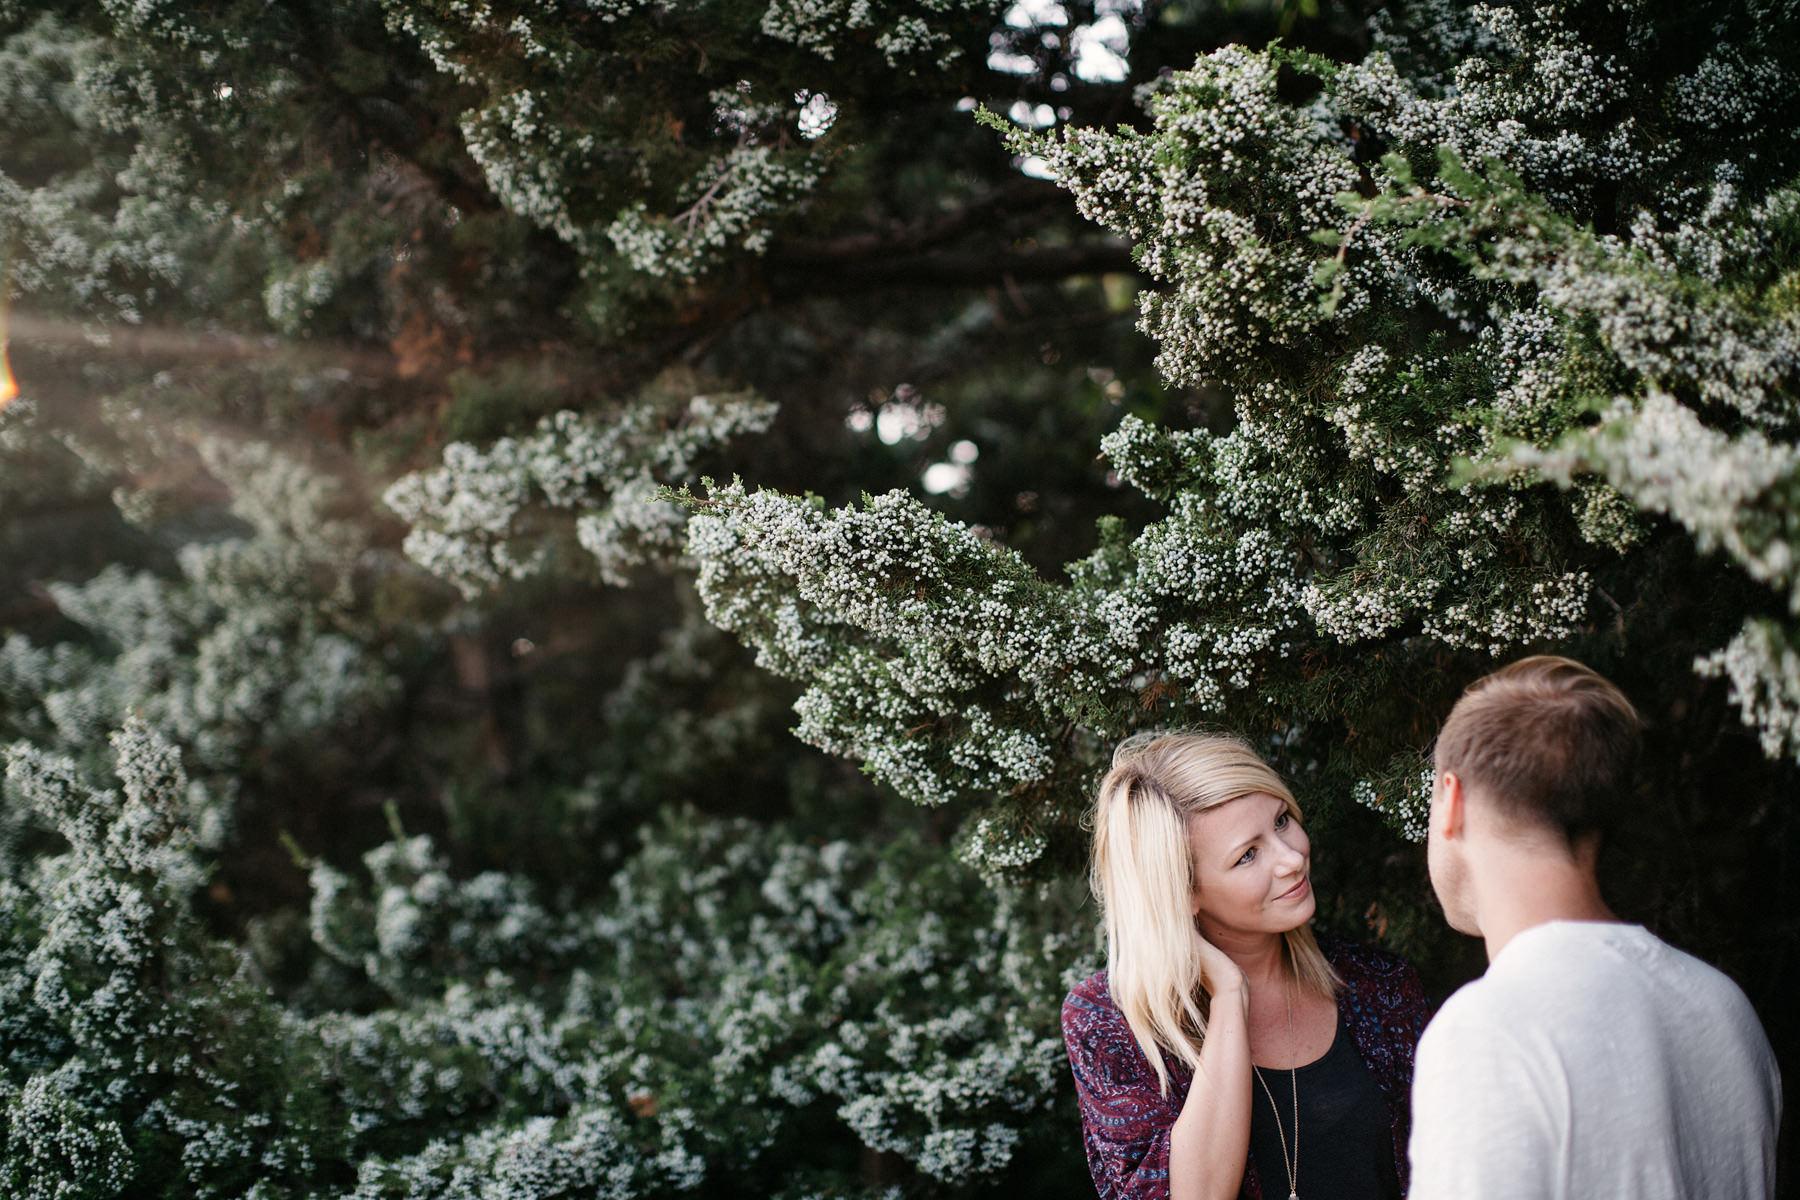 Shawnee Mission Park Engagement Session Kansas City_Kindling Wedding Photography_01.JPG